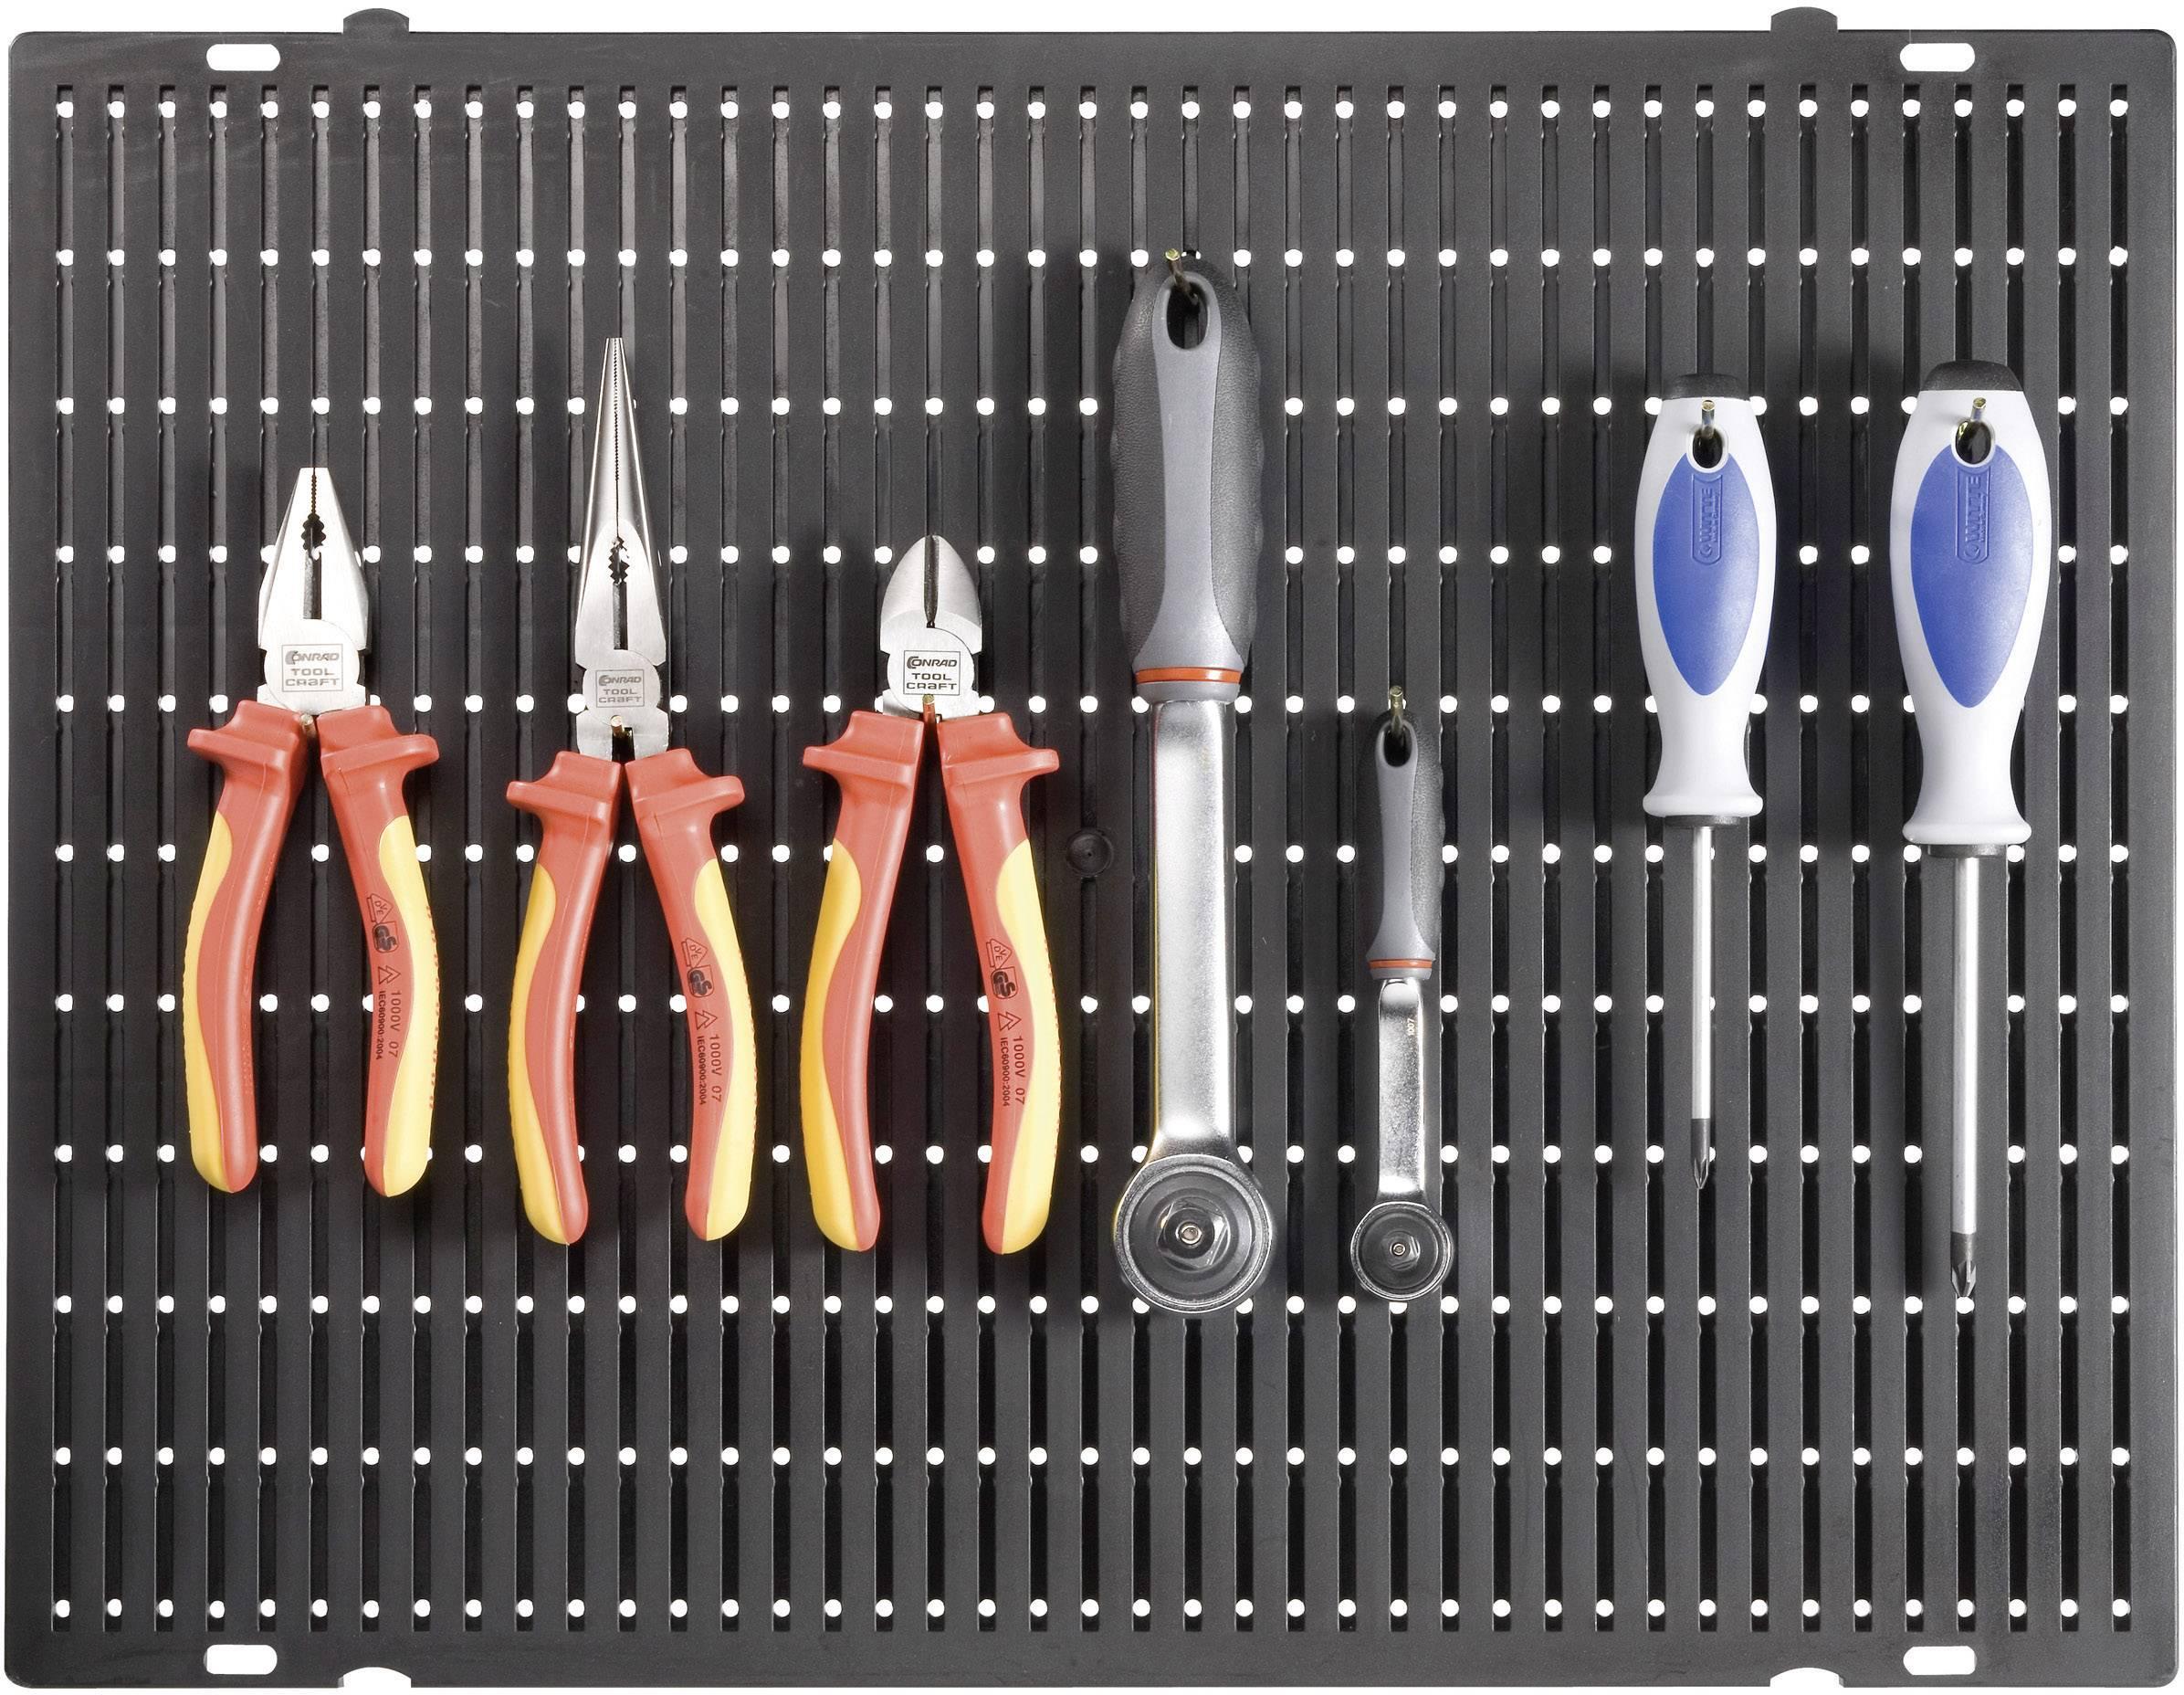 Bekend TOOLCRAFT Gereedschap ophangsysteem (l x b x h) 508 x 390 x 15 mm  #MR38